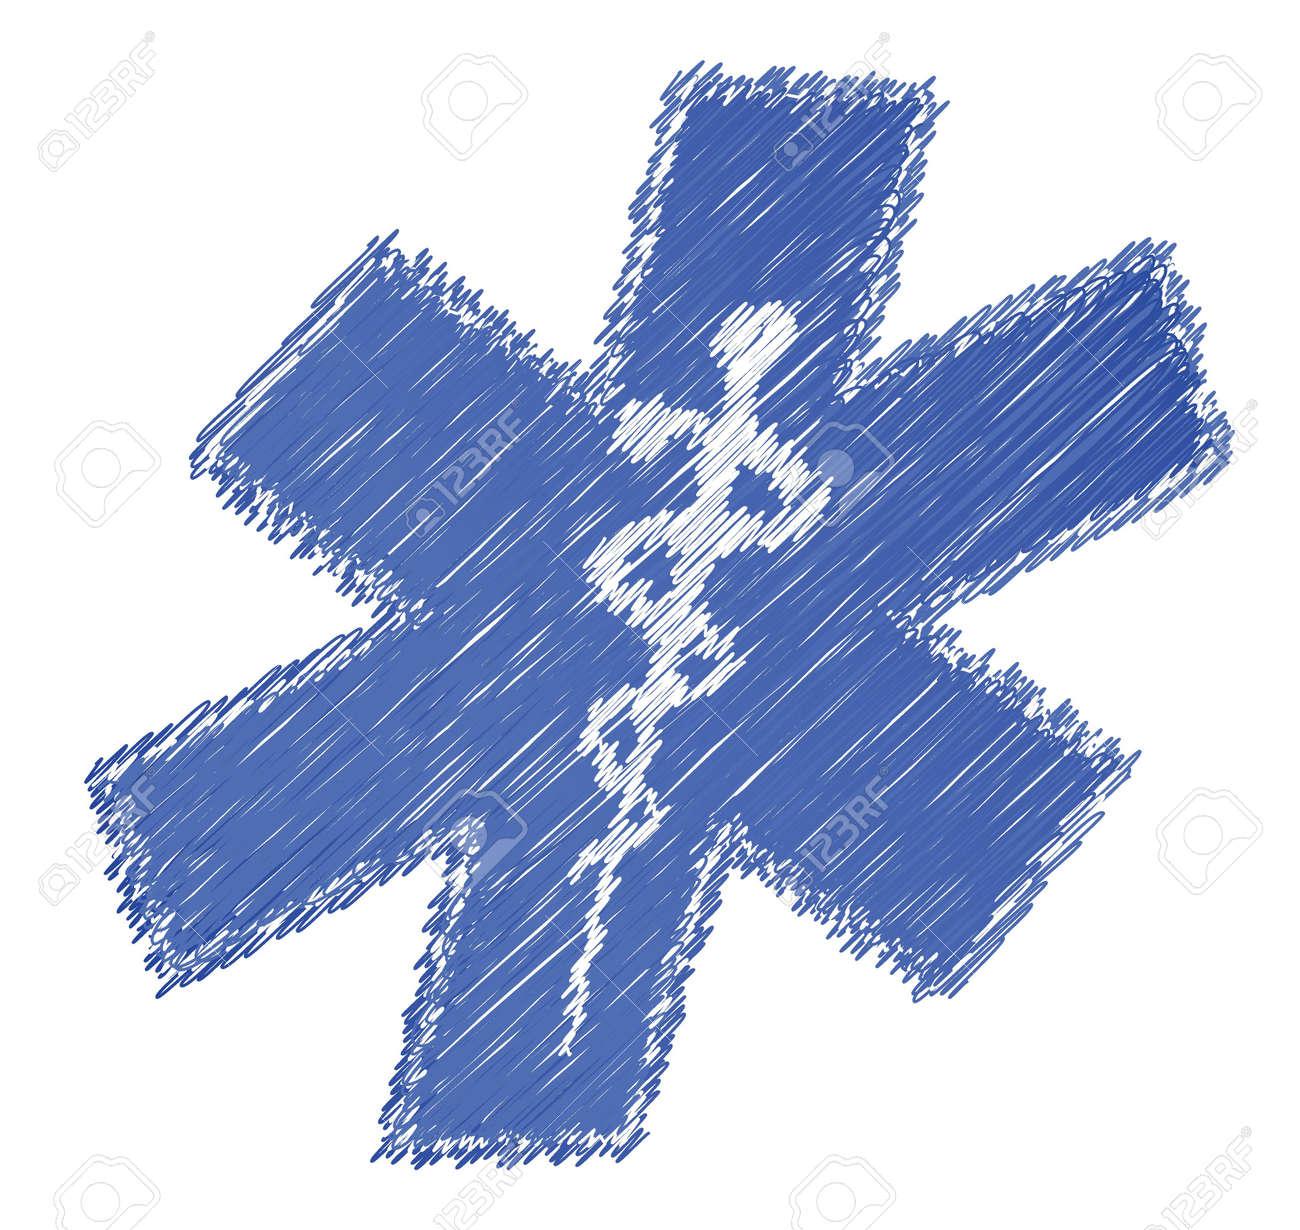 scribble medical symbol illustration design over white background Stock Vector - 15987951